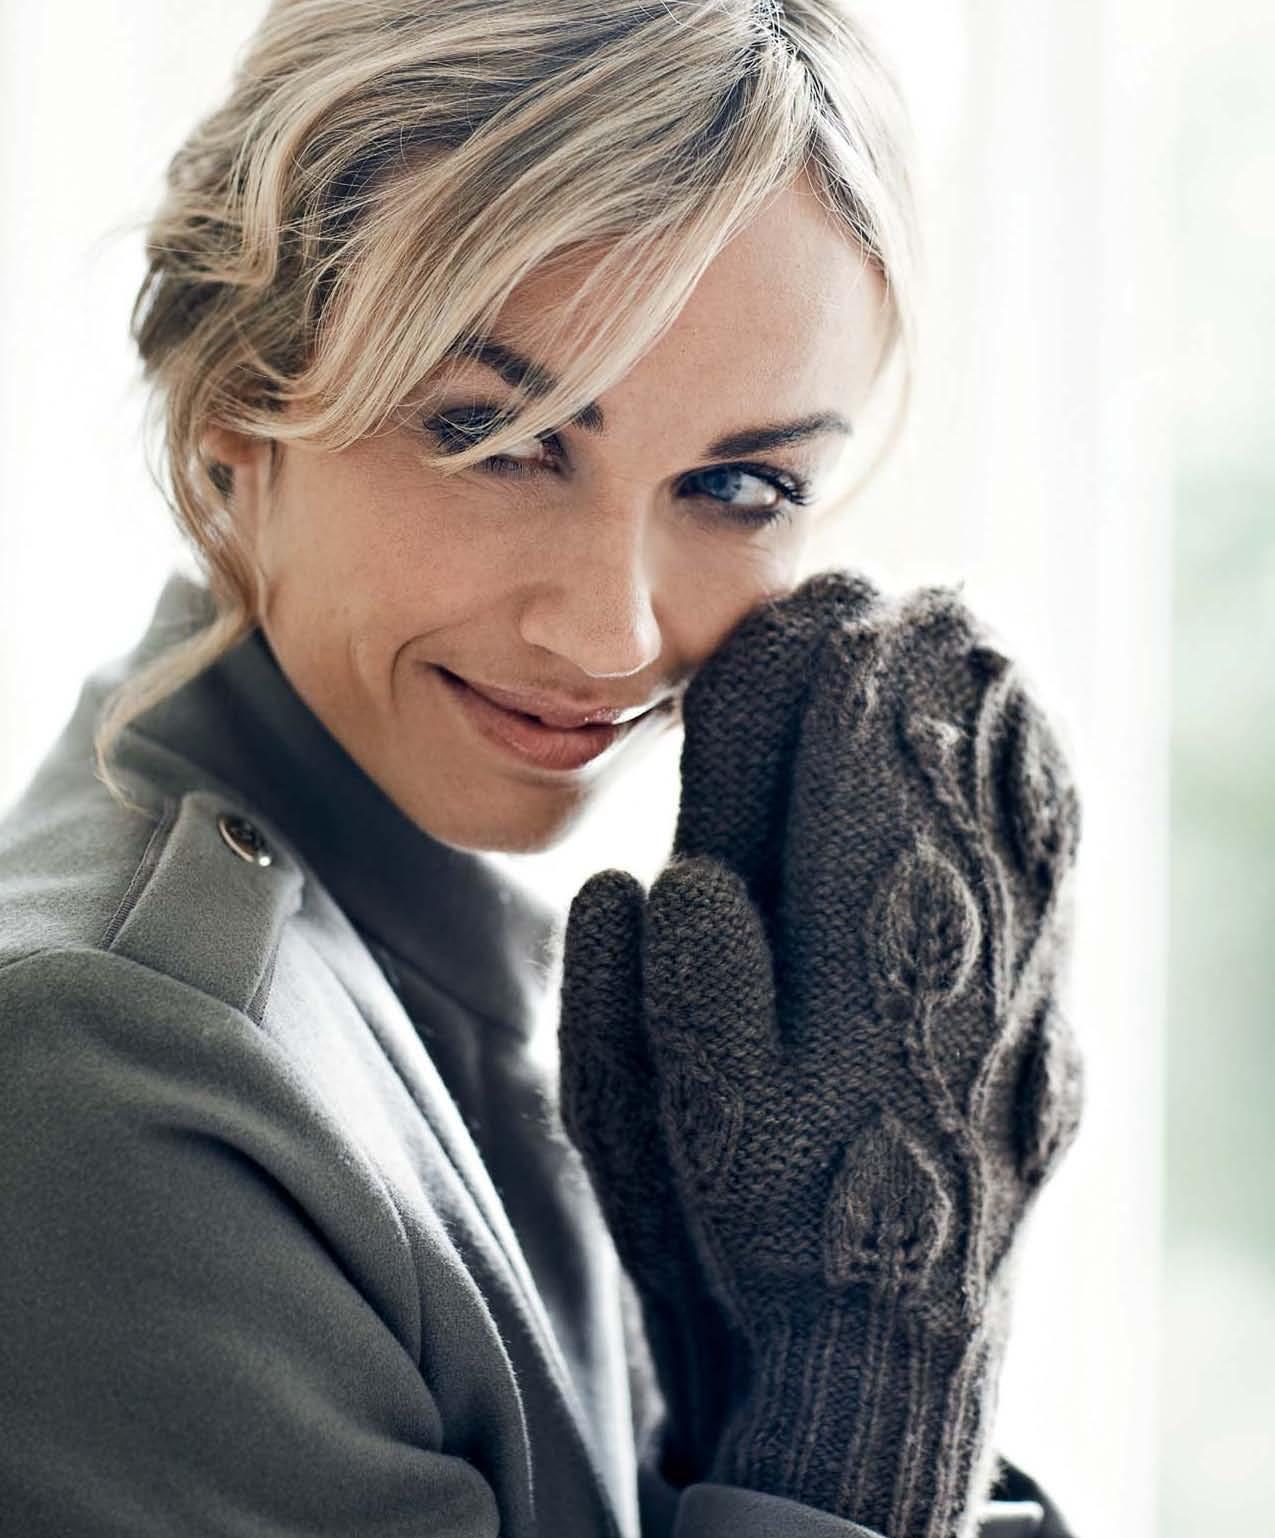 Perfectly Feminine Knits - Nora beauty image